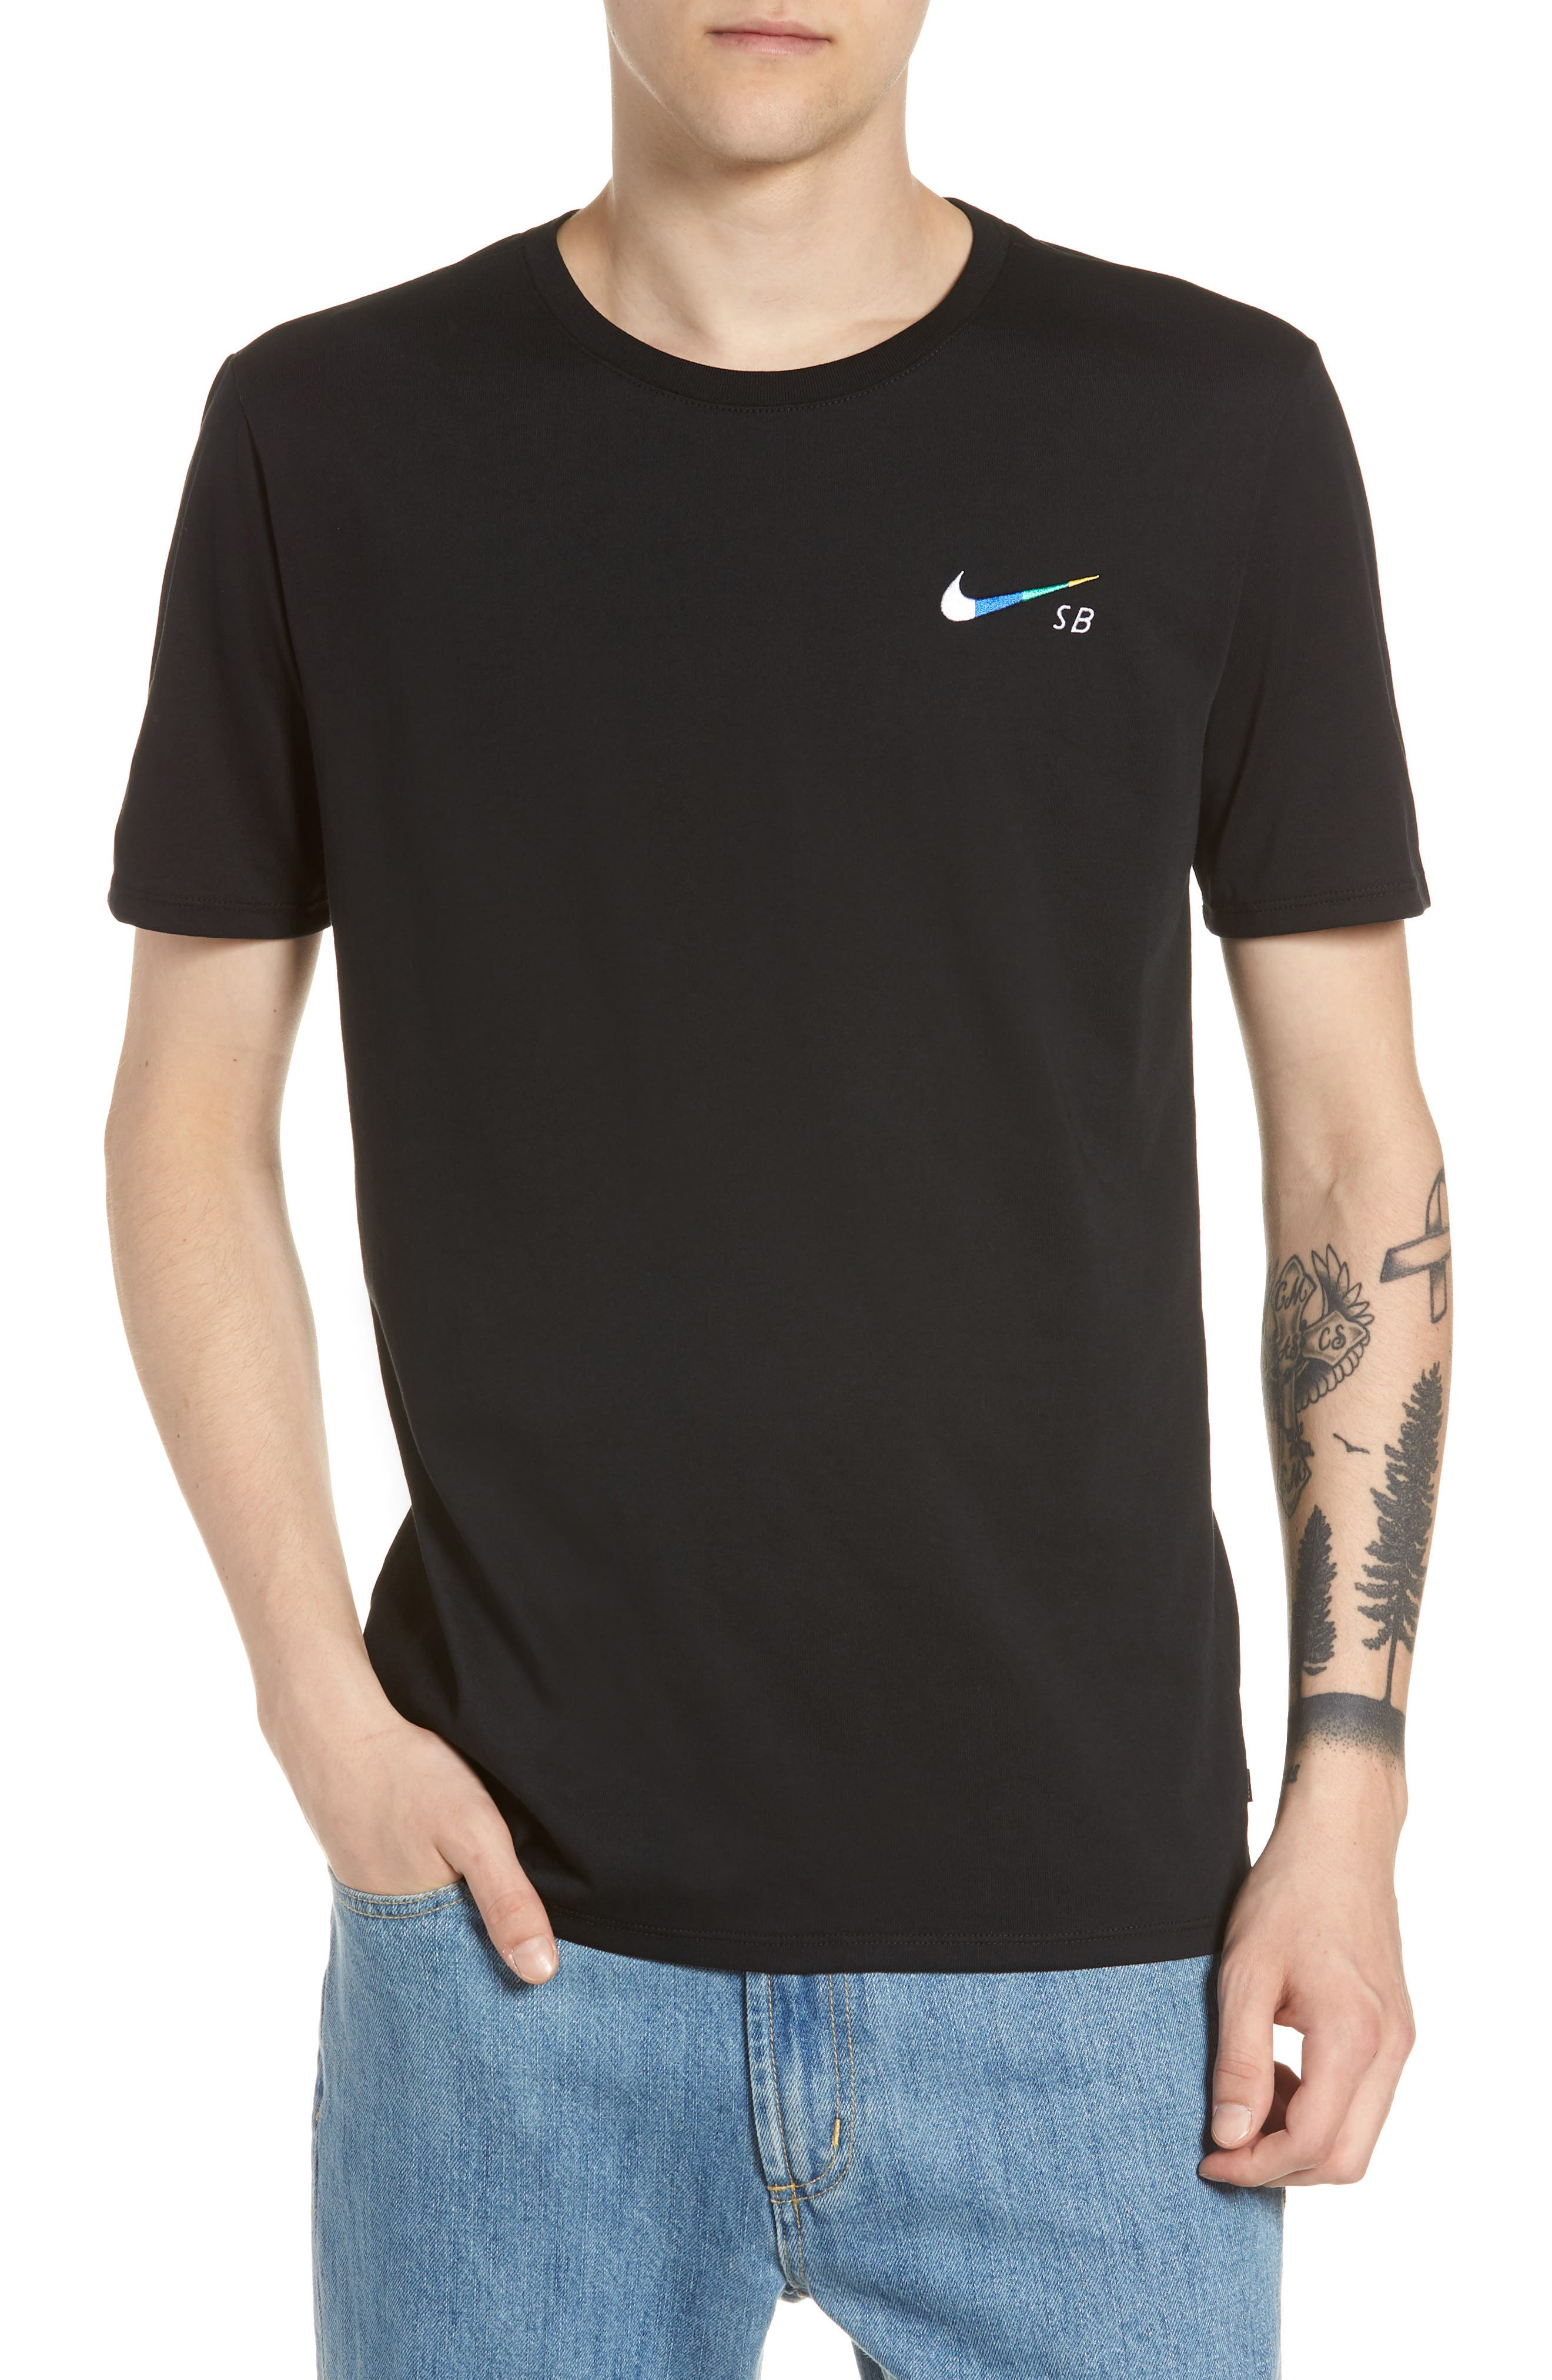 SB Dry DFC Global Graphic T-Shirt,                             Main thumbnail 1, color,                             Black/ White